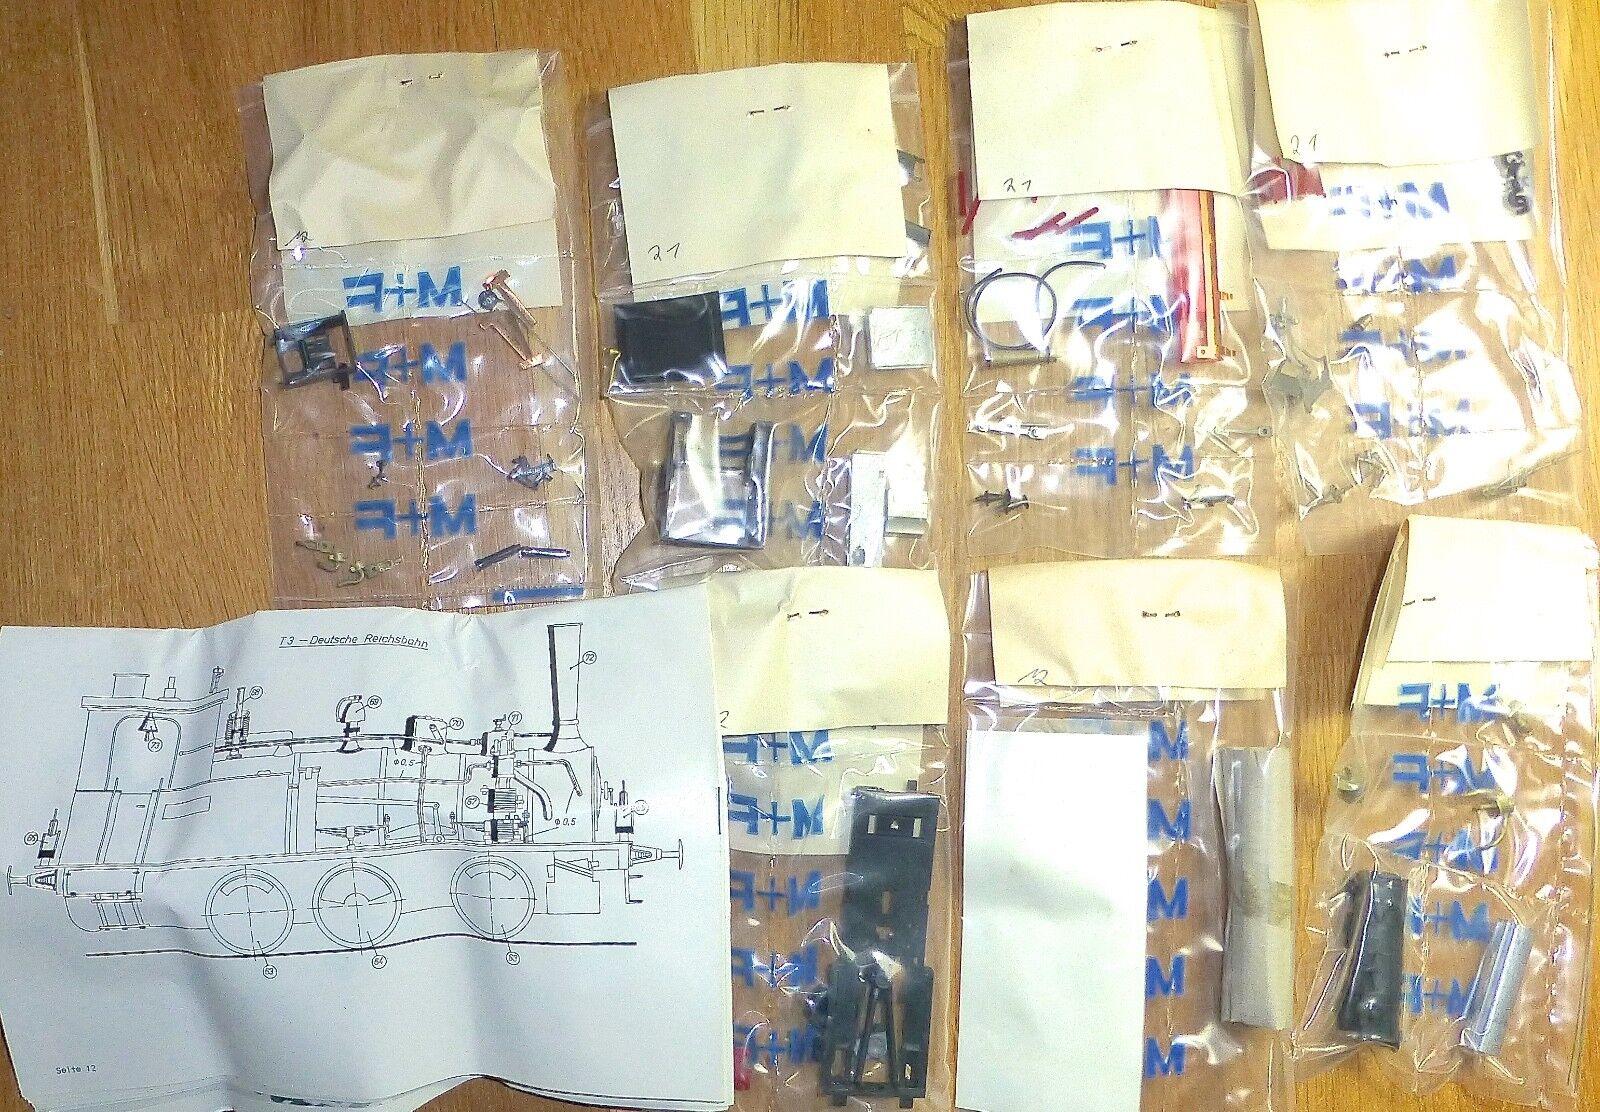 T3 reichsbahnausführung Rebuilt Kit M+F 052 Special H0 1 87 Å